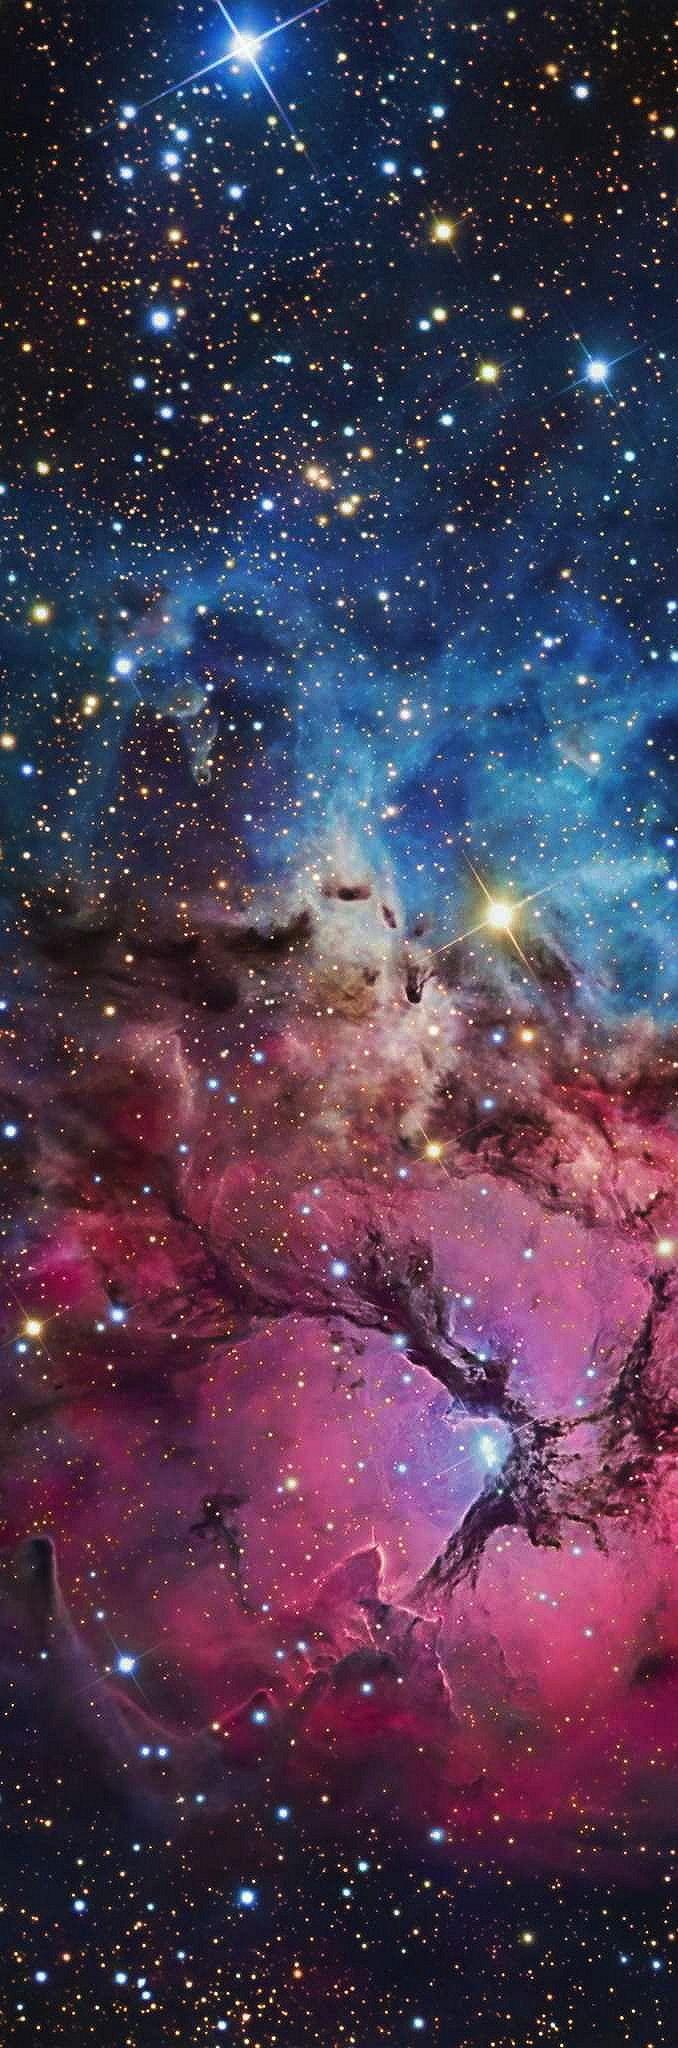 Triffid Nebula.                                                                                                                                                                                 More